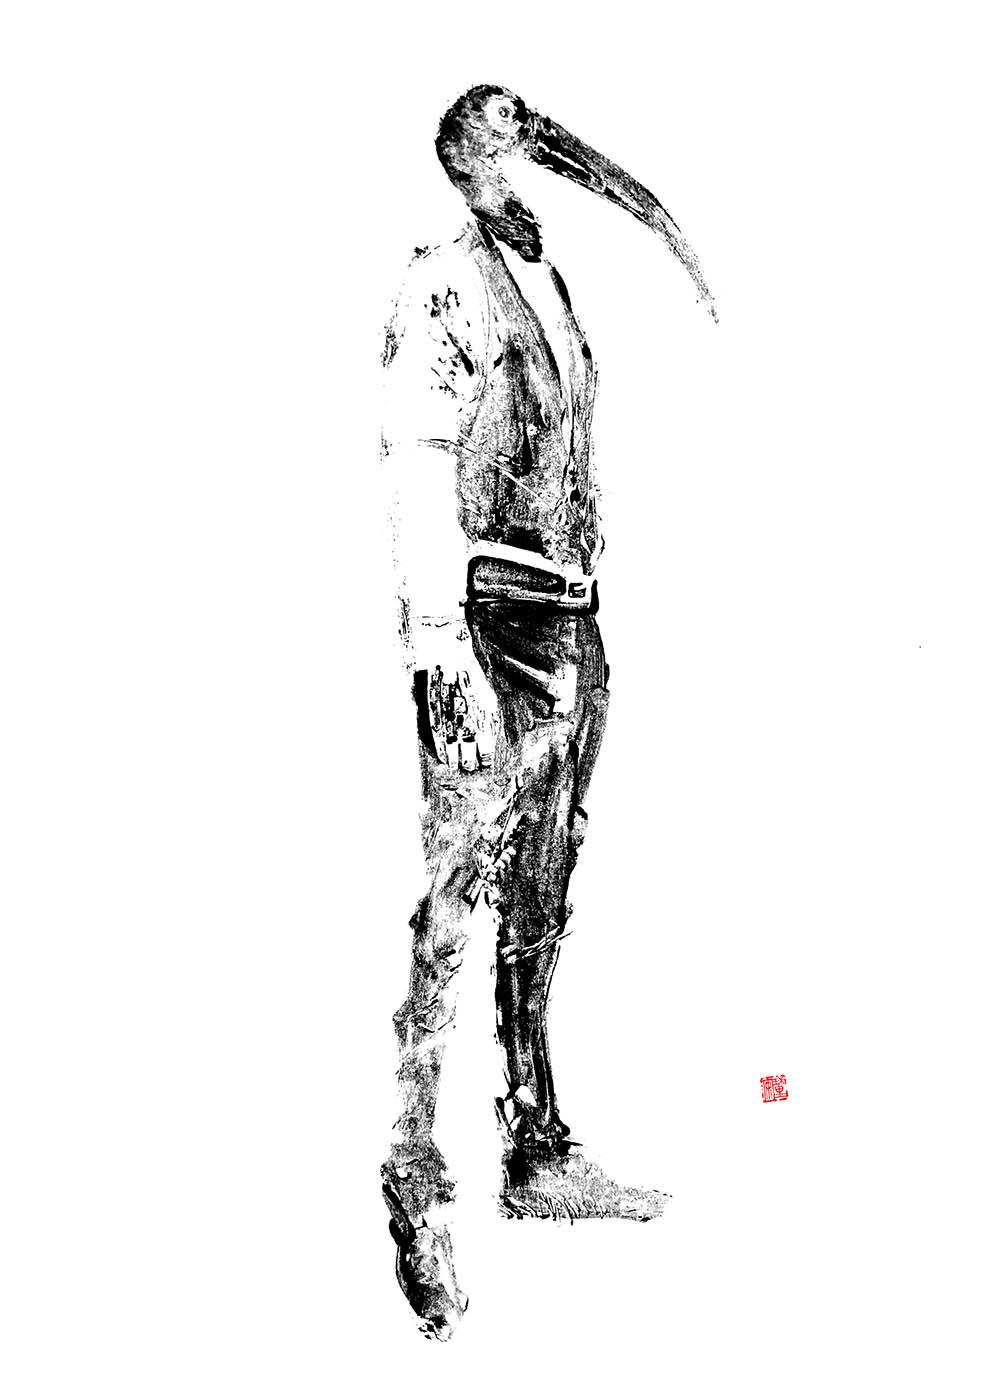 Horus, 2013, mixed media on paper